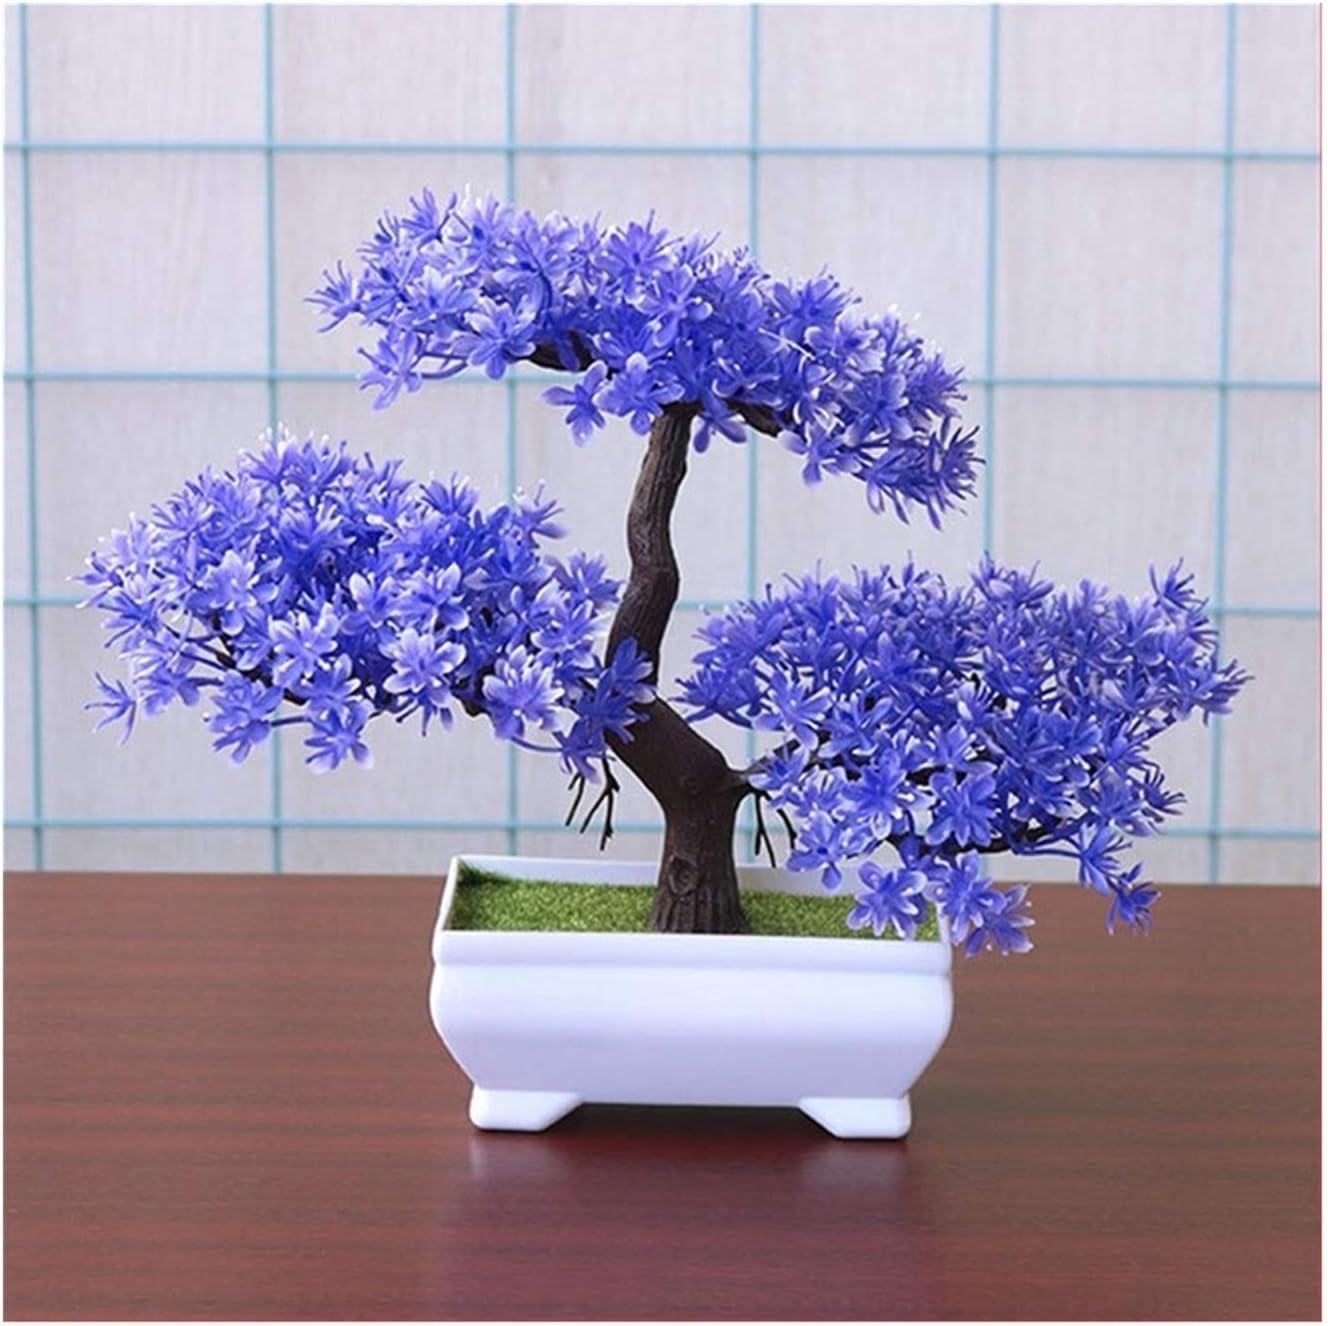 YIXIN2013SHOP low-pricing Artificial Bonsai Tree Very popular Plants Bon Small